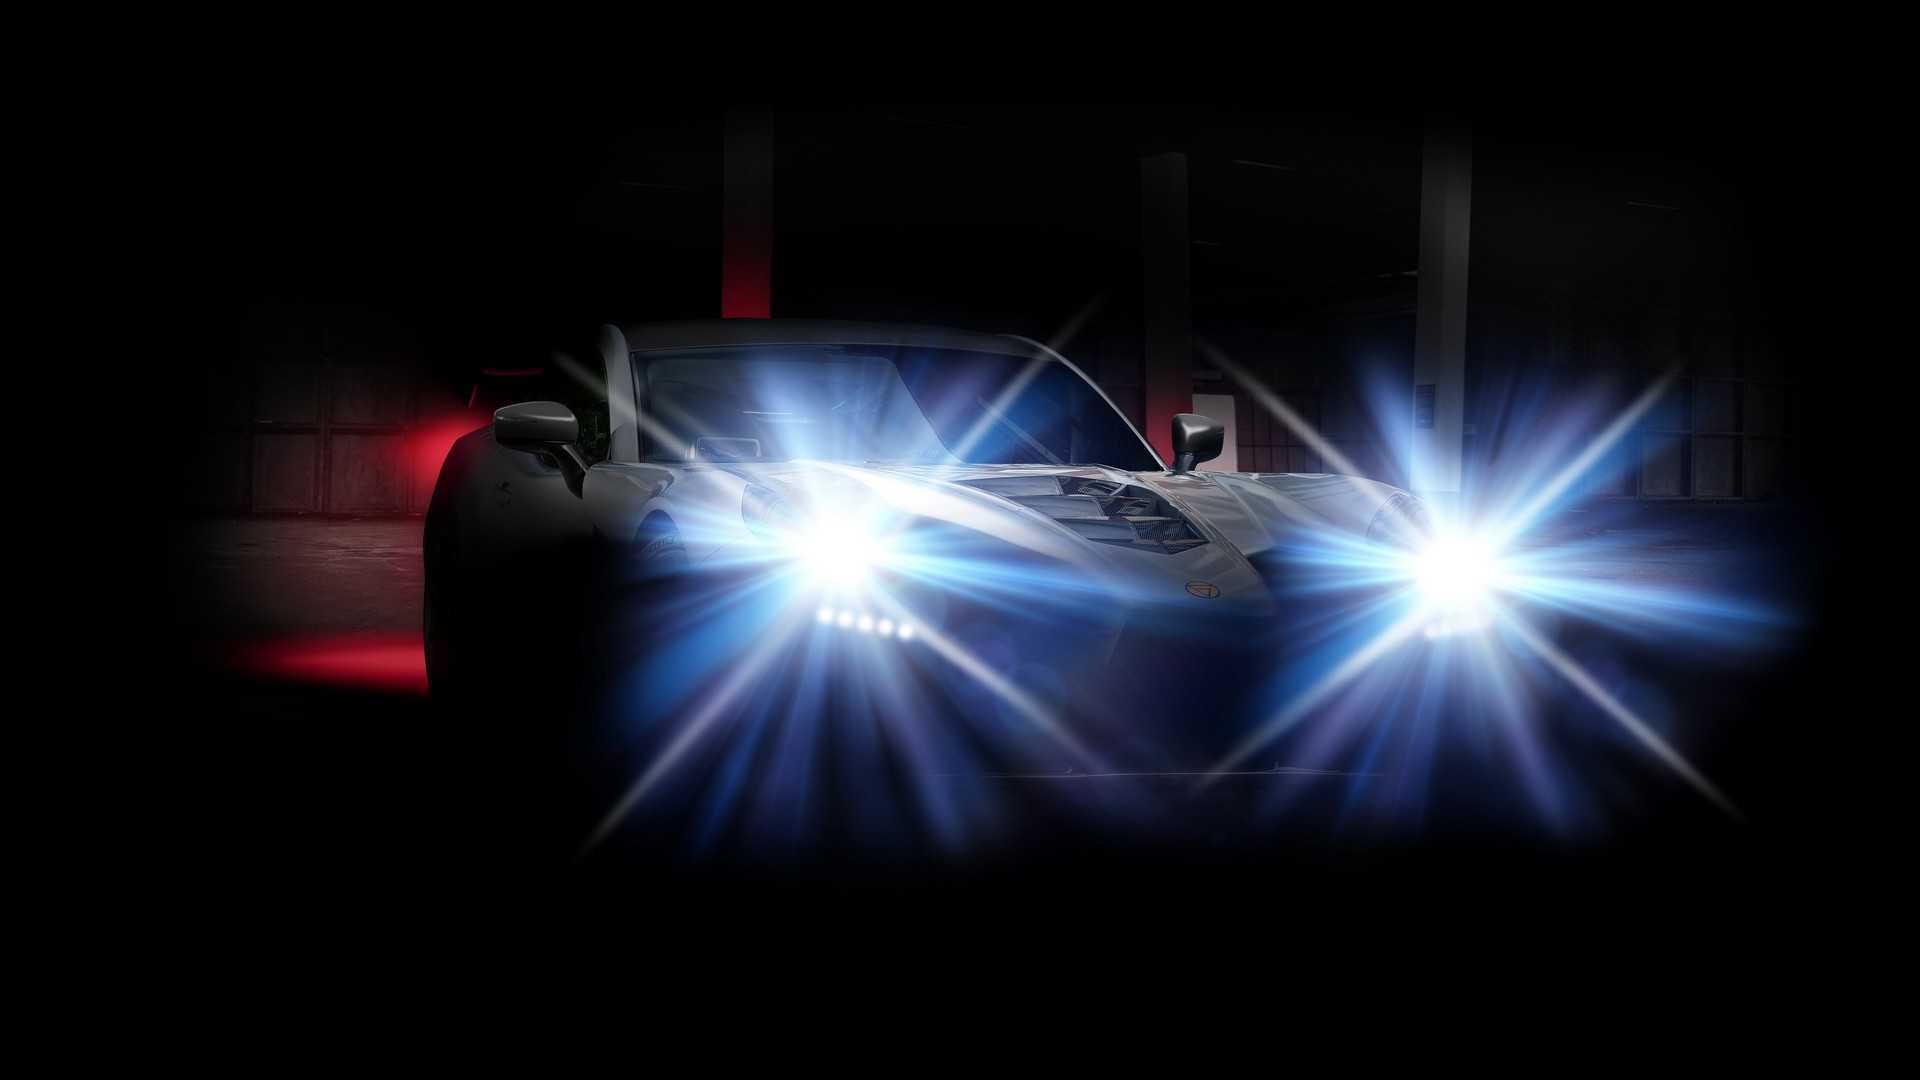 Teaser for Ginetta supercar - January 2019